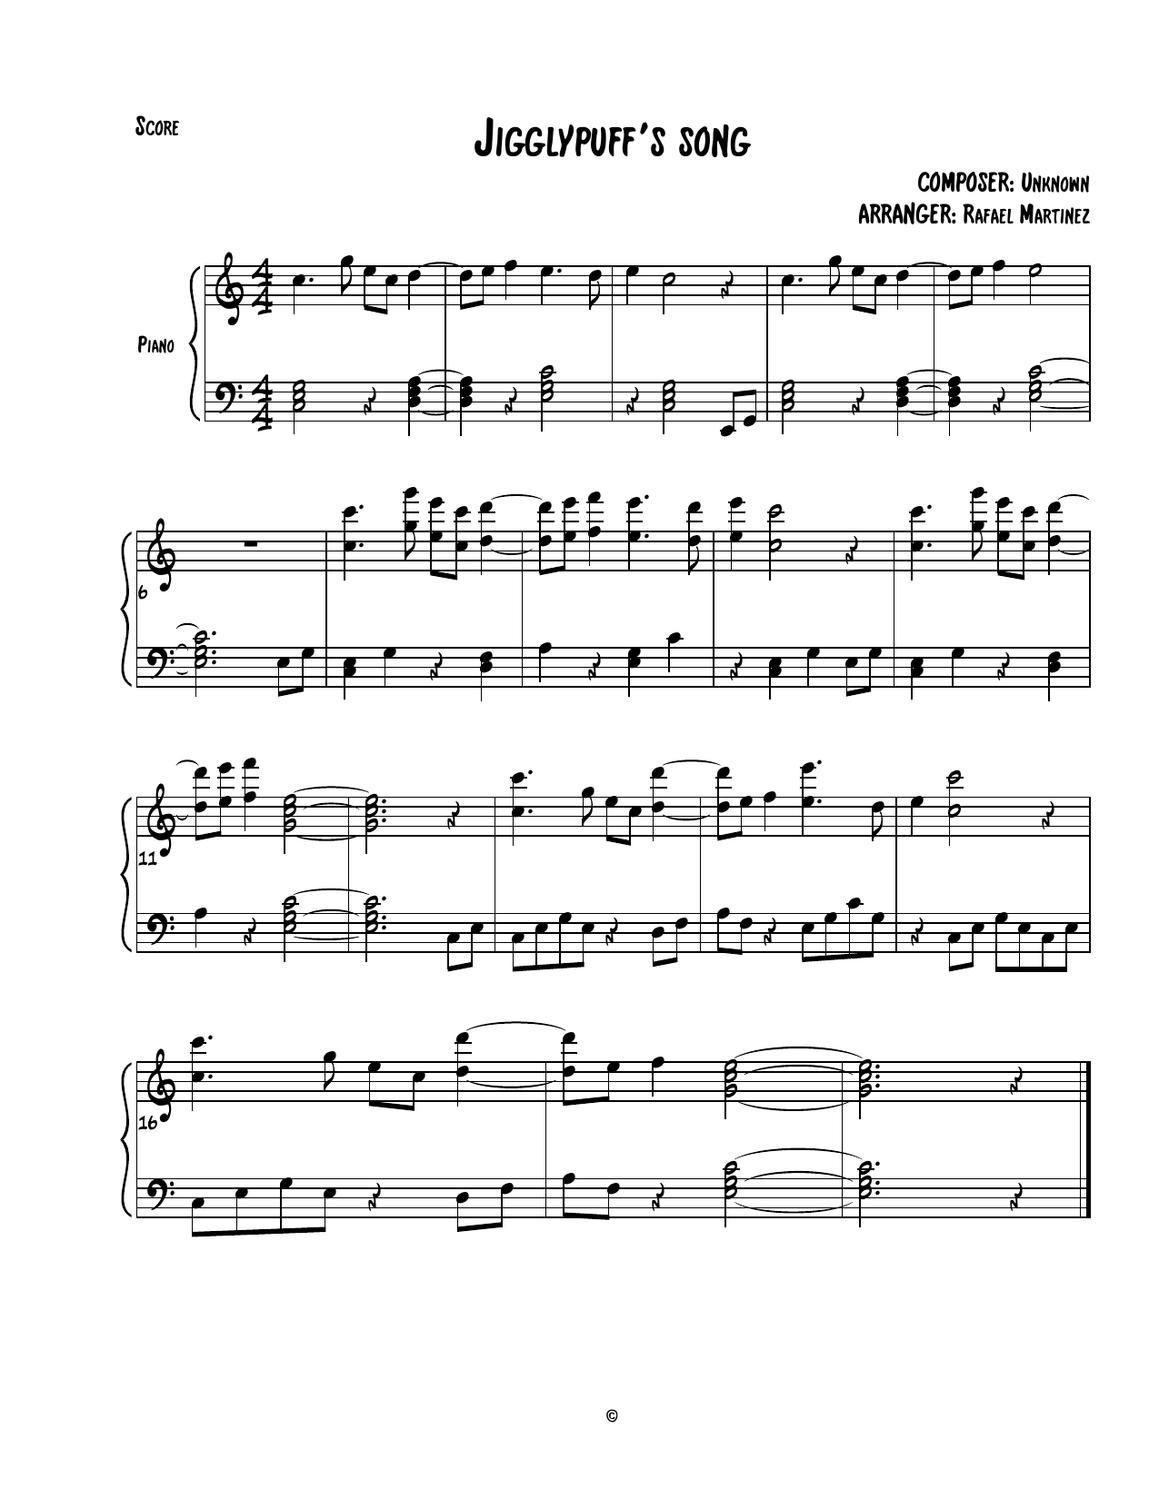 Jigglypuff's Song sheet music by Rafael Martínez - issuu